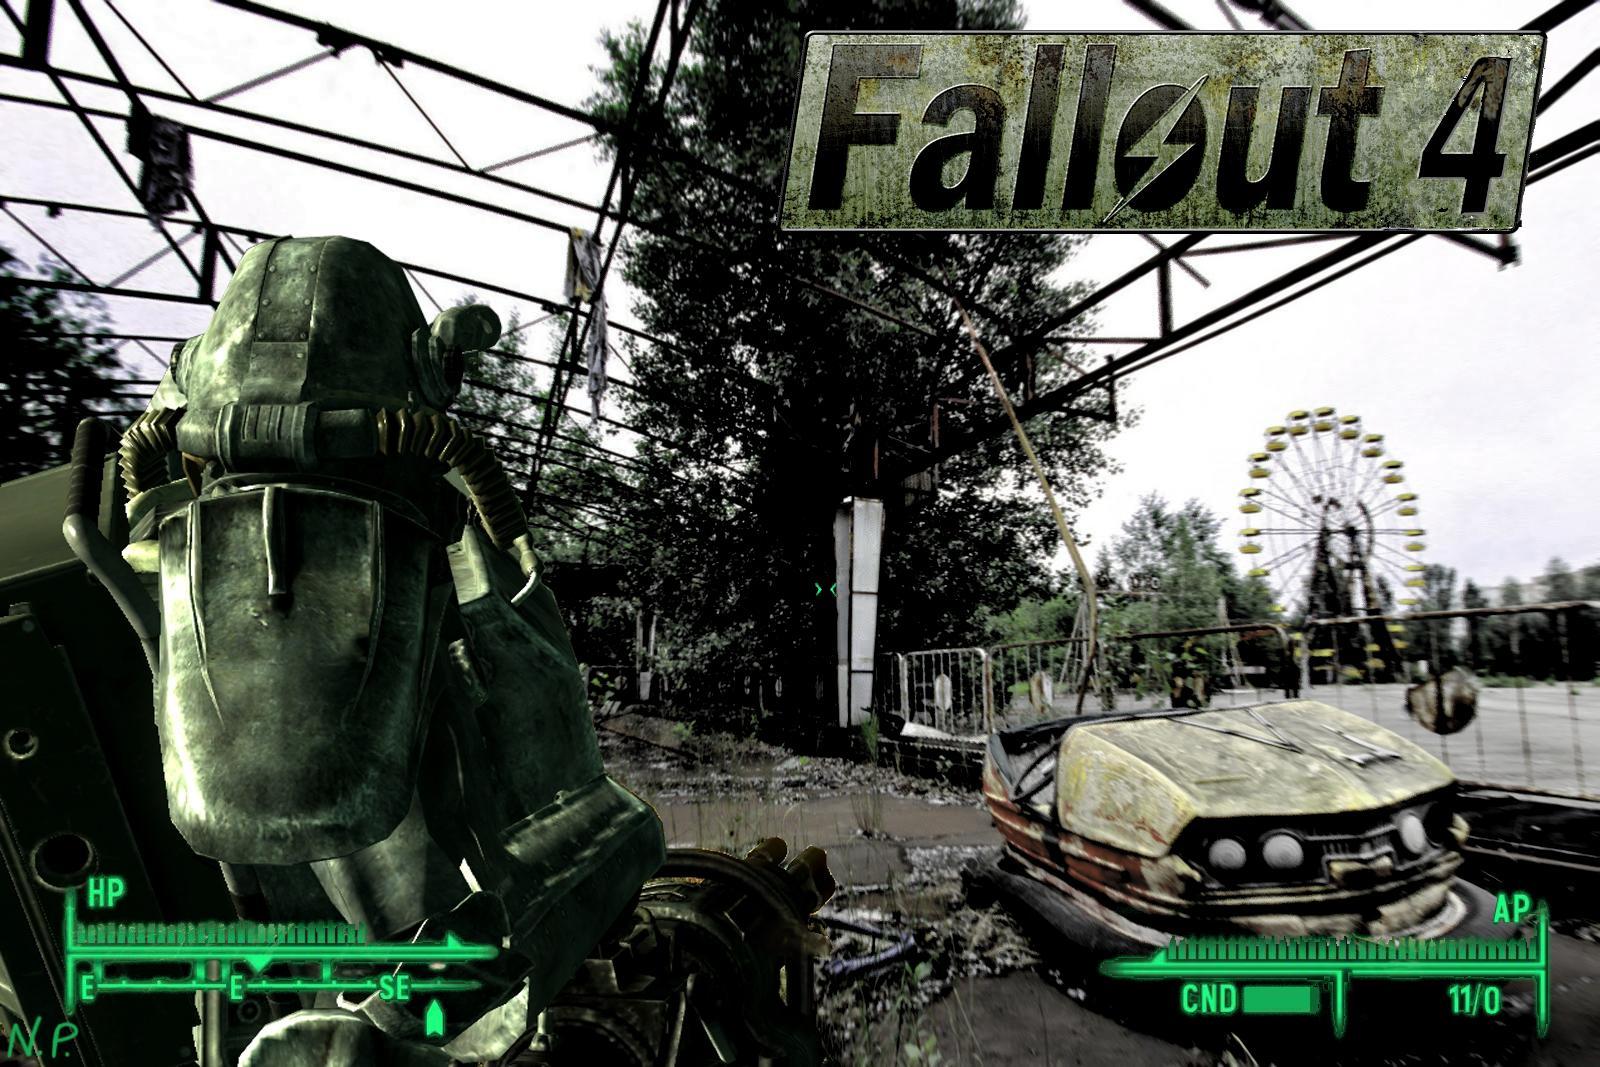 Fallout 4 6 Cool Hd Wallpaper Wallpaper 1600x1067